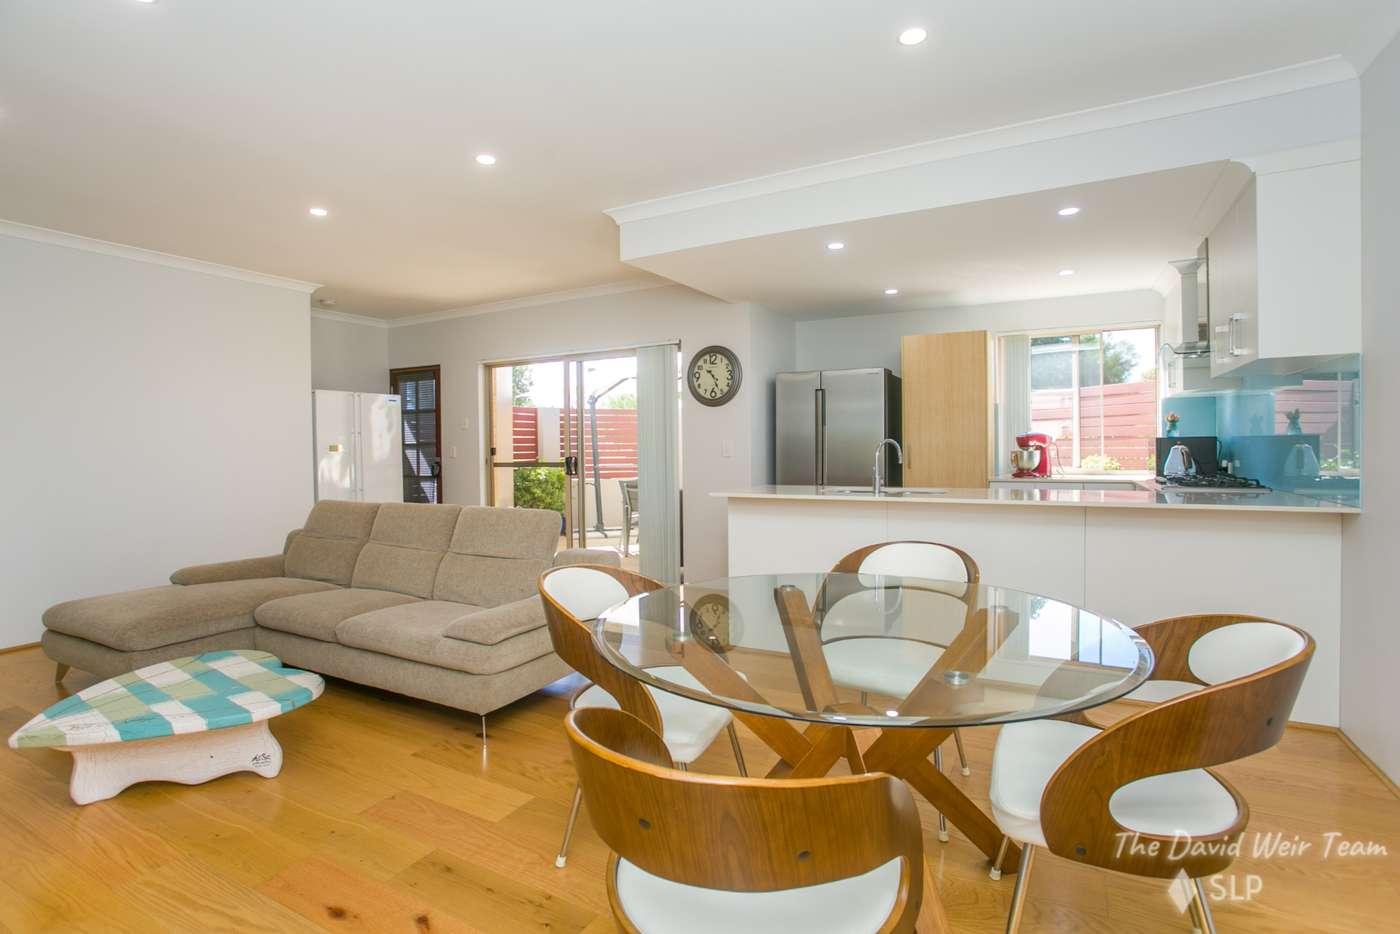 Main view of Homely house listing, 5 Maltarra Street, Nollamara WA 6061